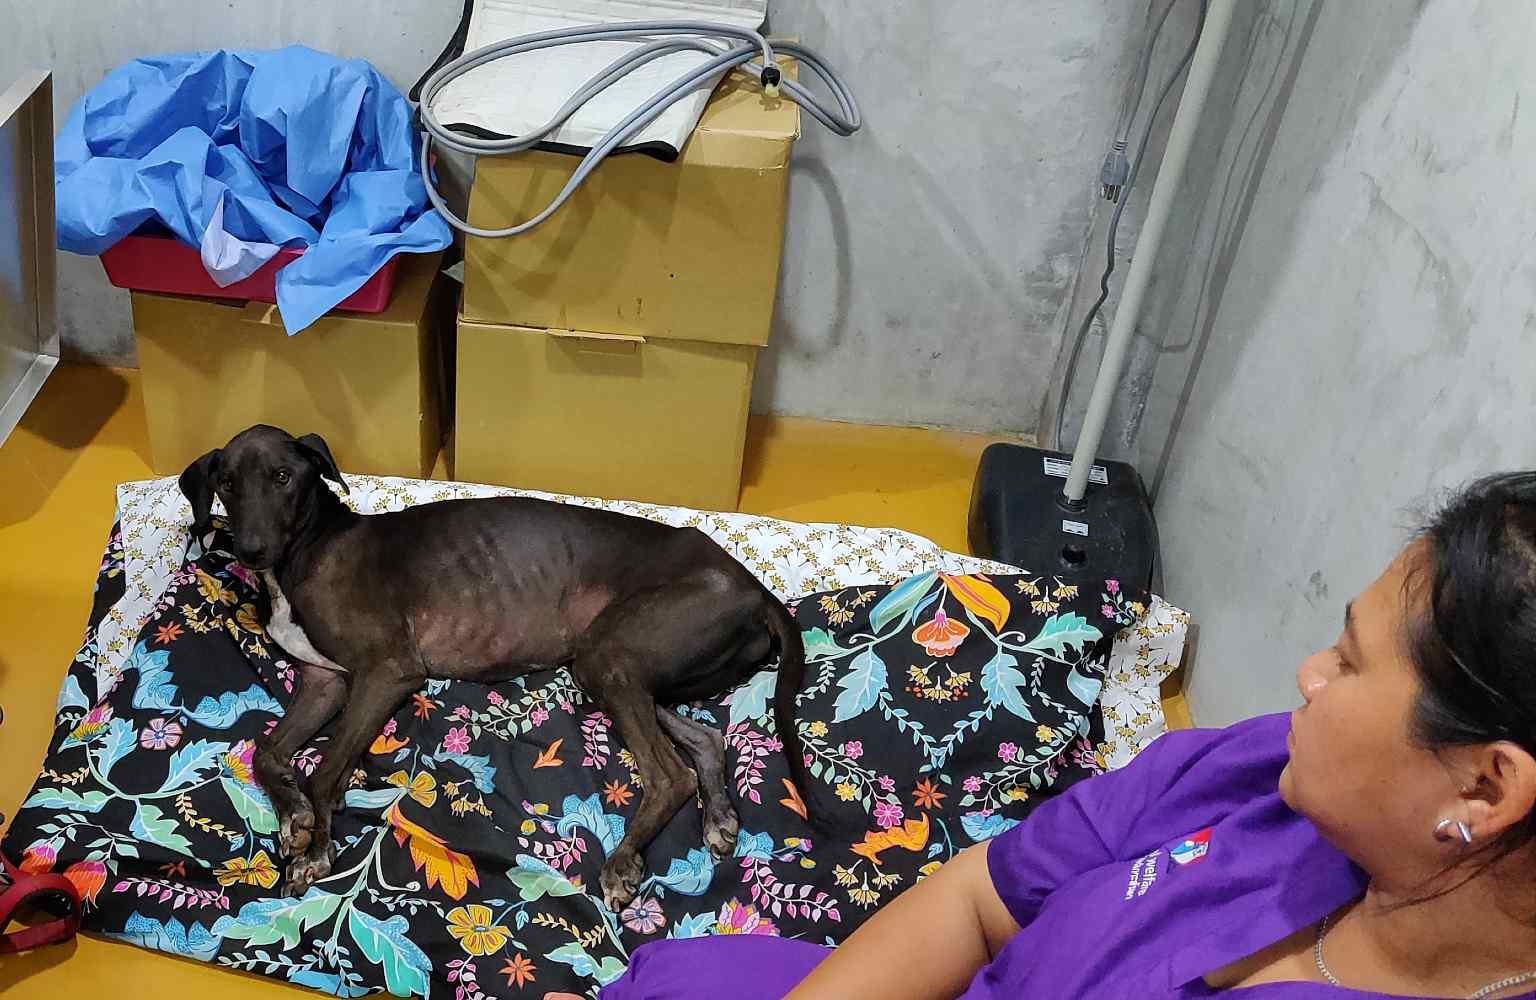 Lanta Animal Welfare, Rio in de ziekenboeg